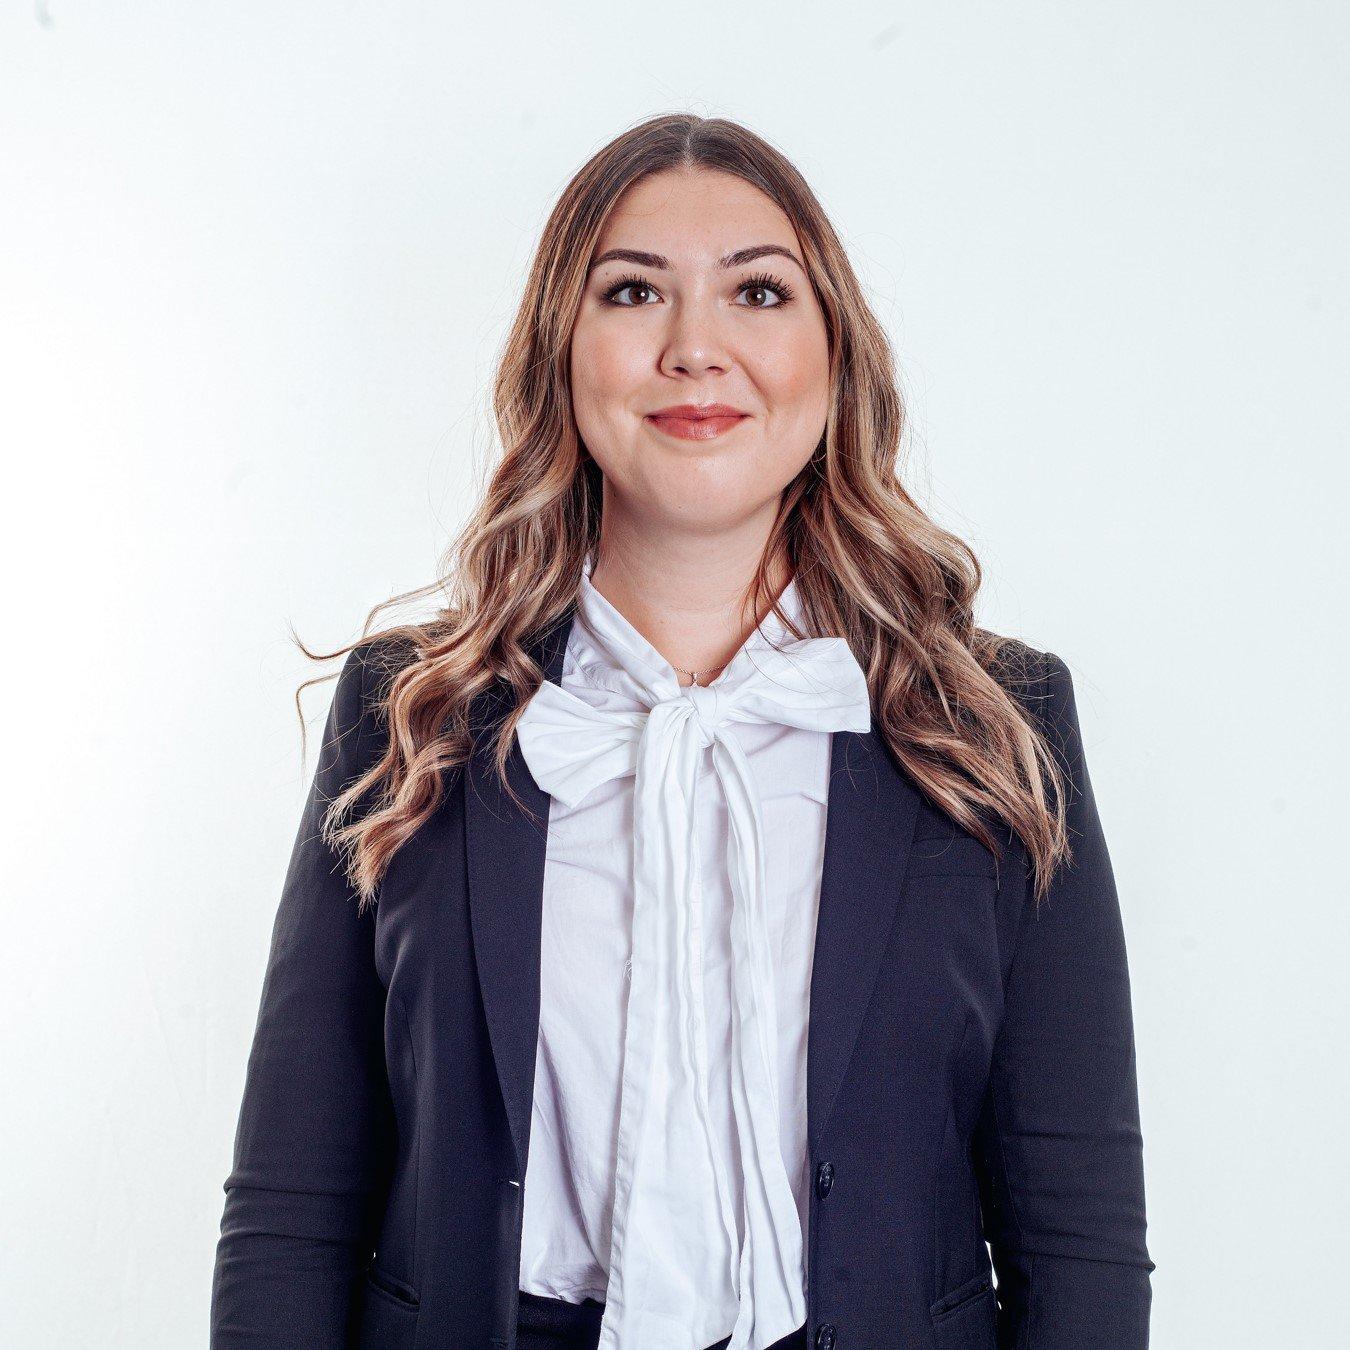 Agnes Ördén